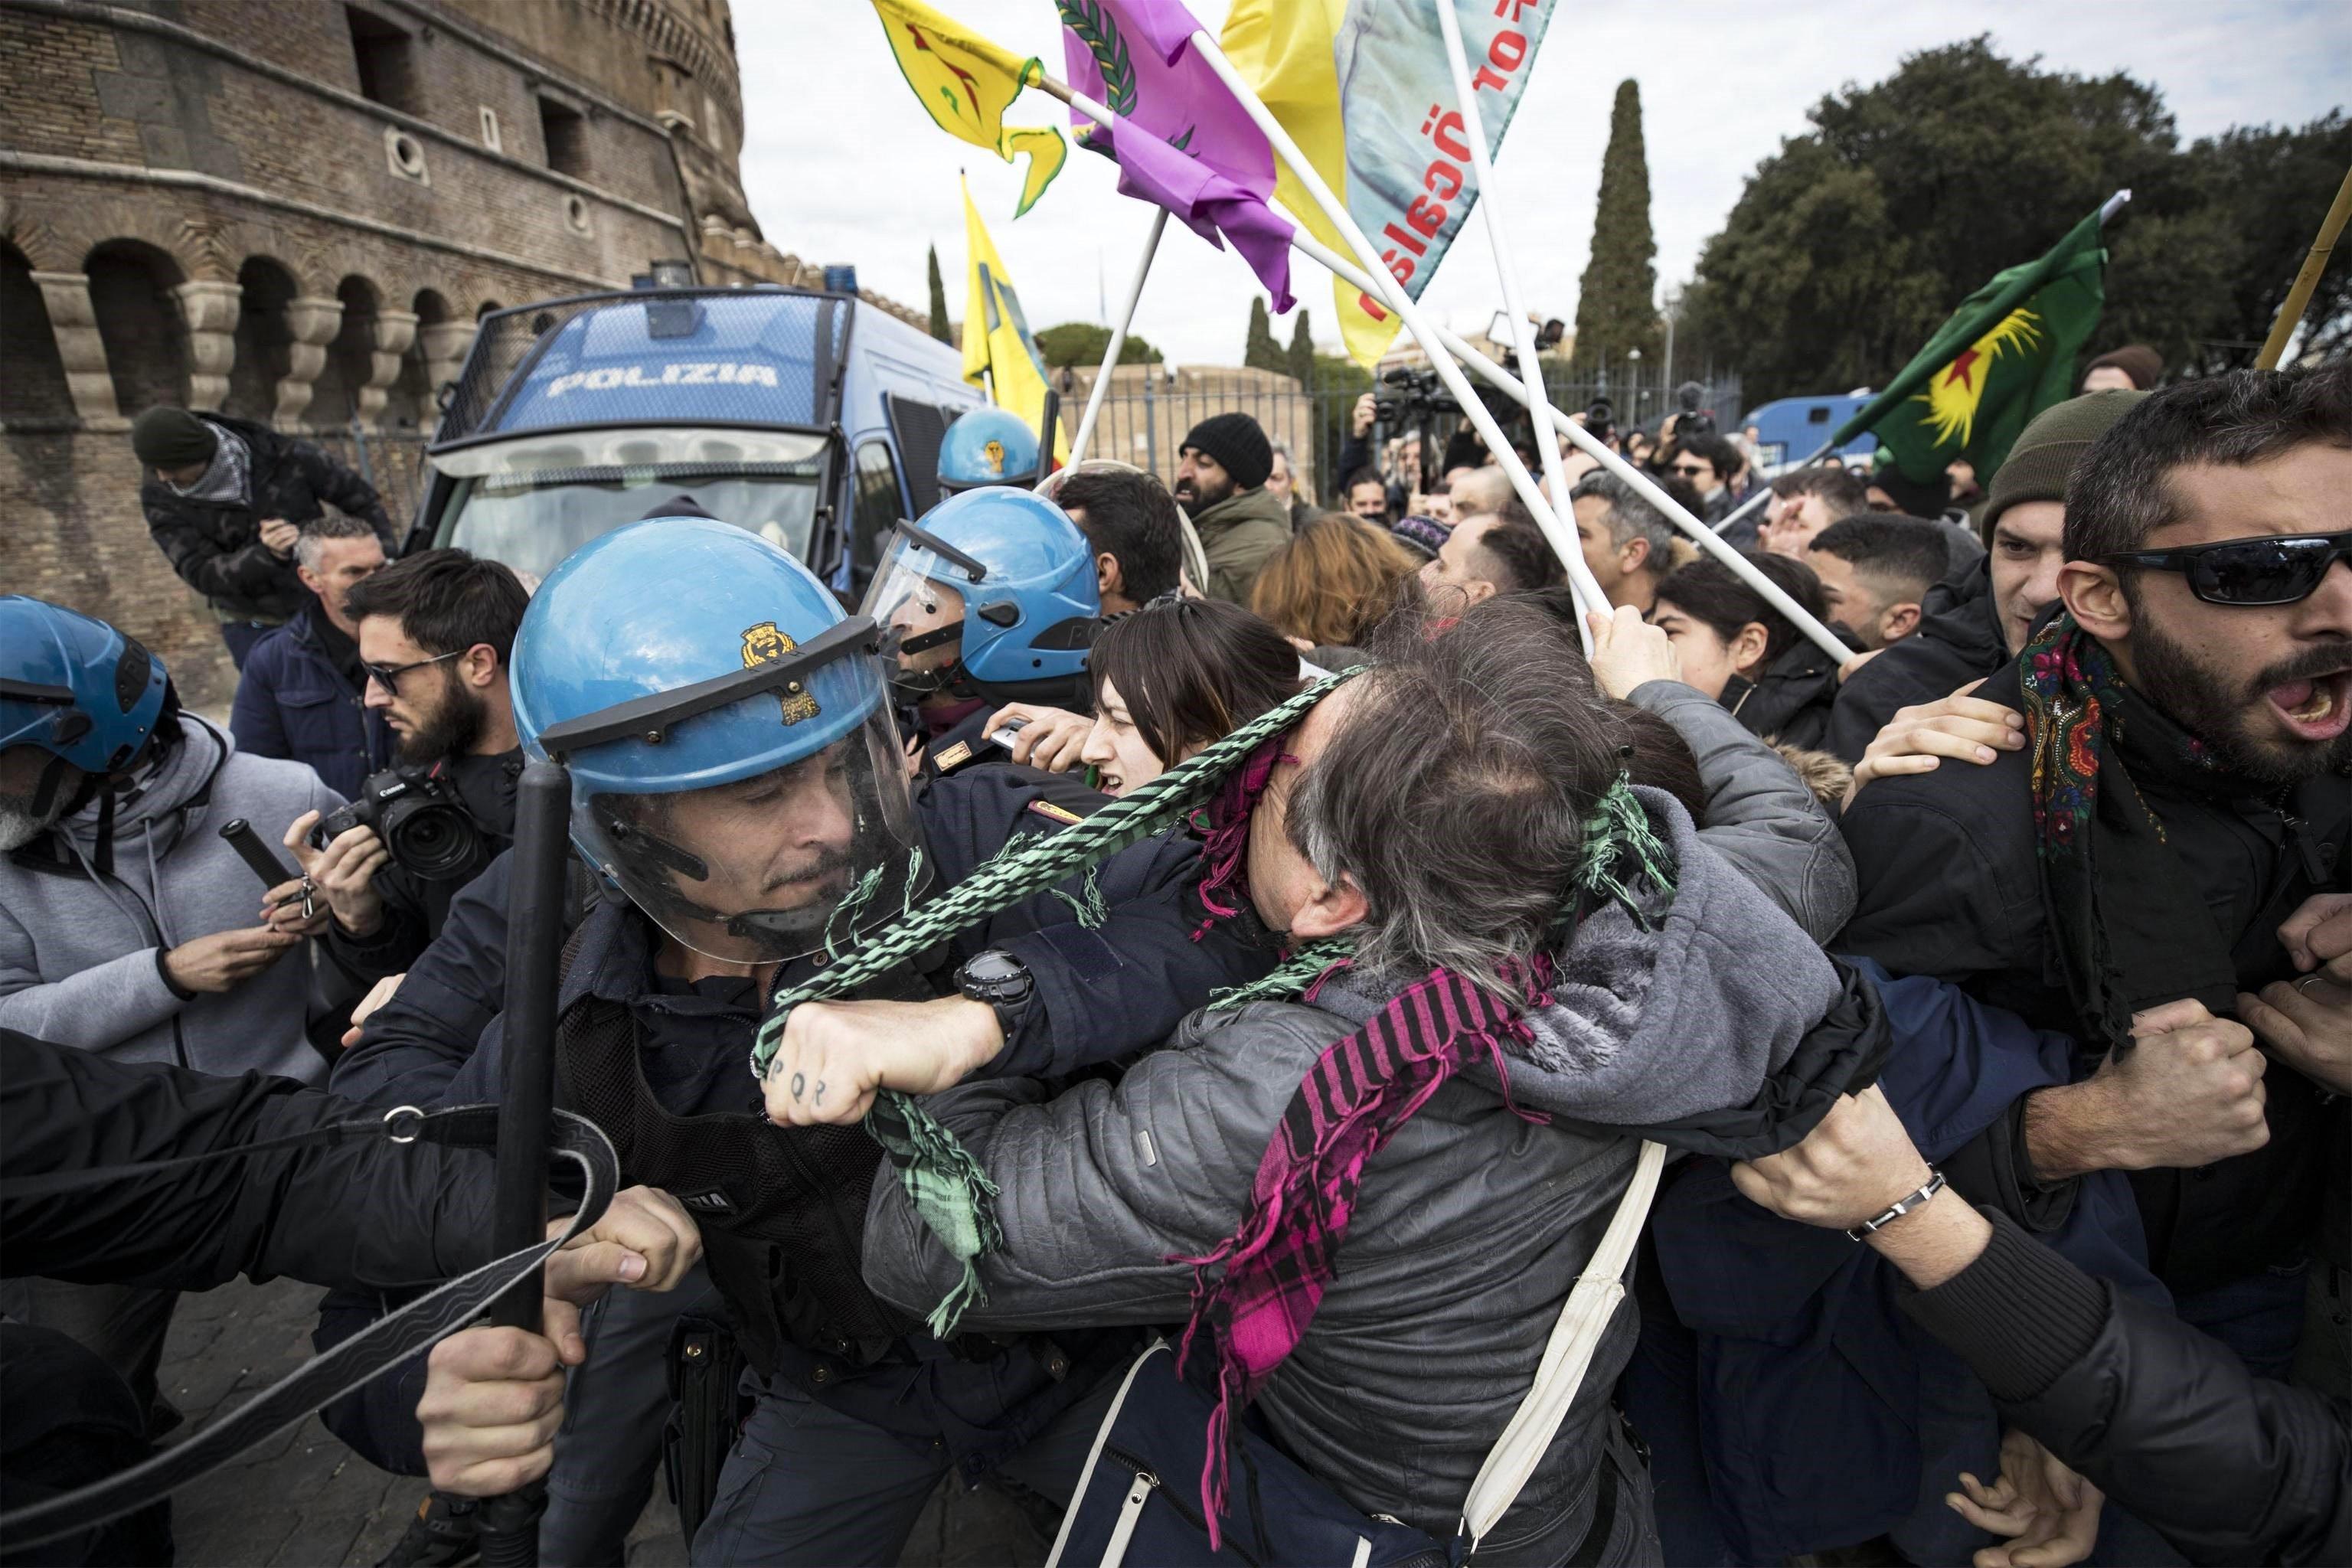 Manifestants s'enfronten a antidisturbis durant una manifestació contra la visita del president turc, Recep Tayyip Erdogan, a Roma (Itàlia). /MASSIMO PERCOSSI